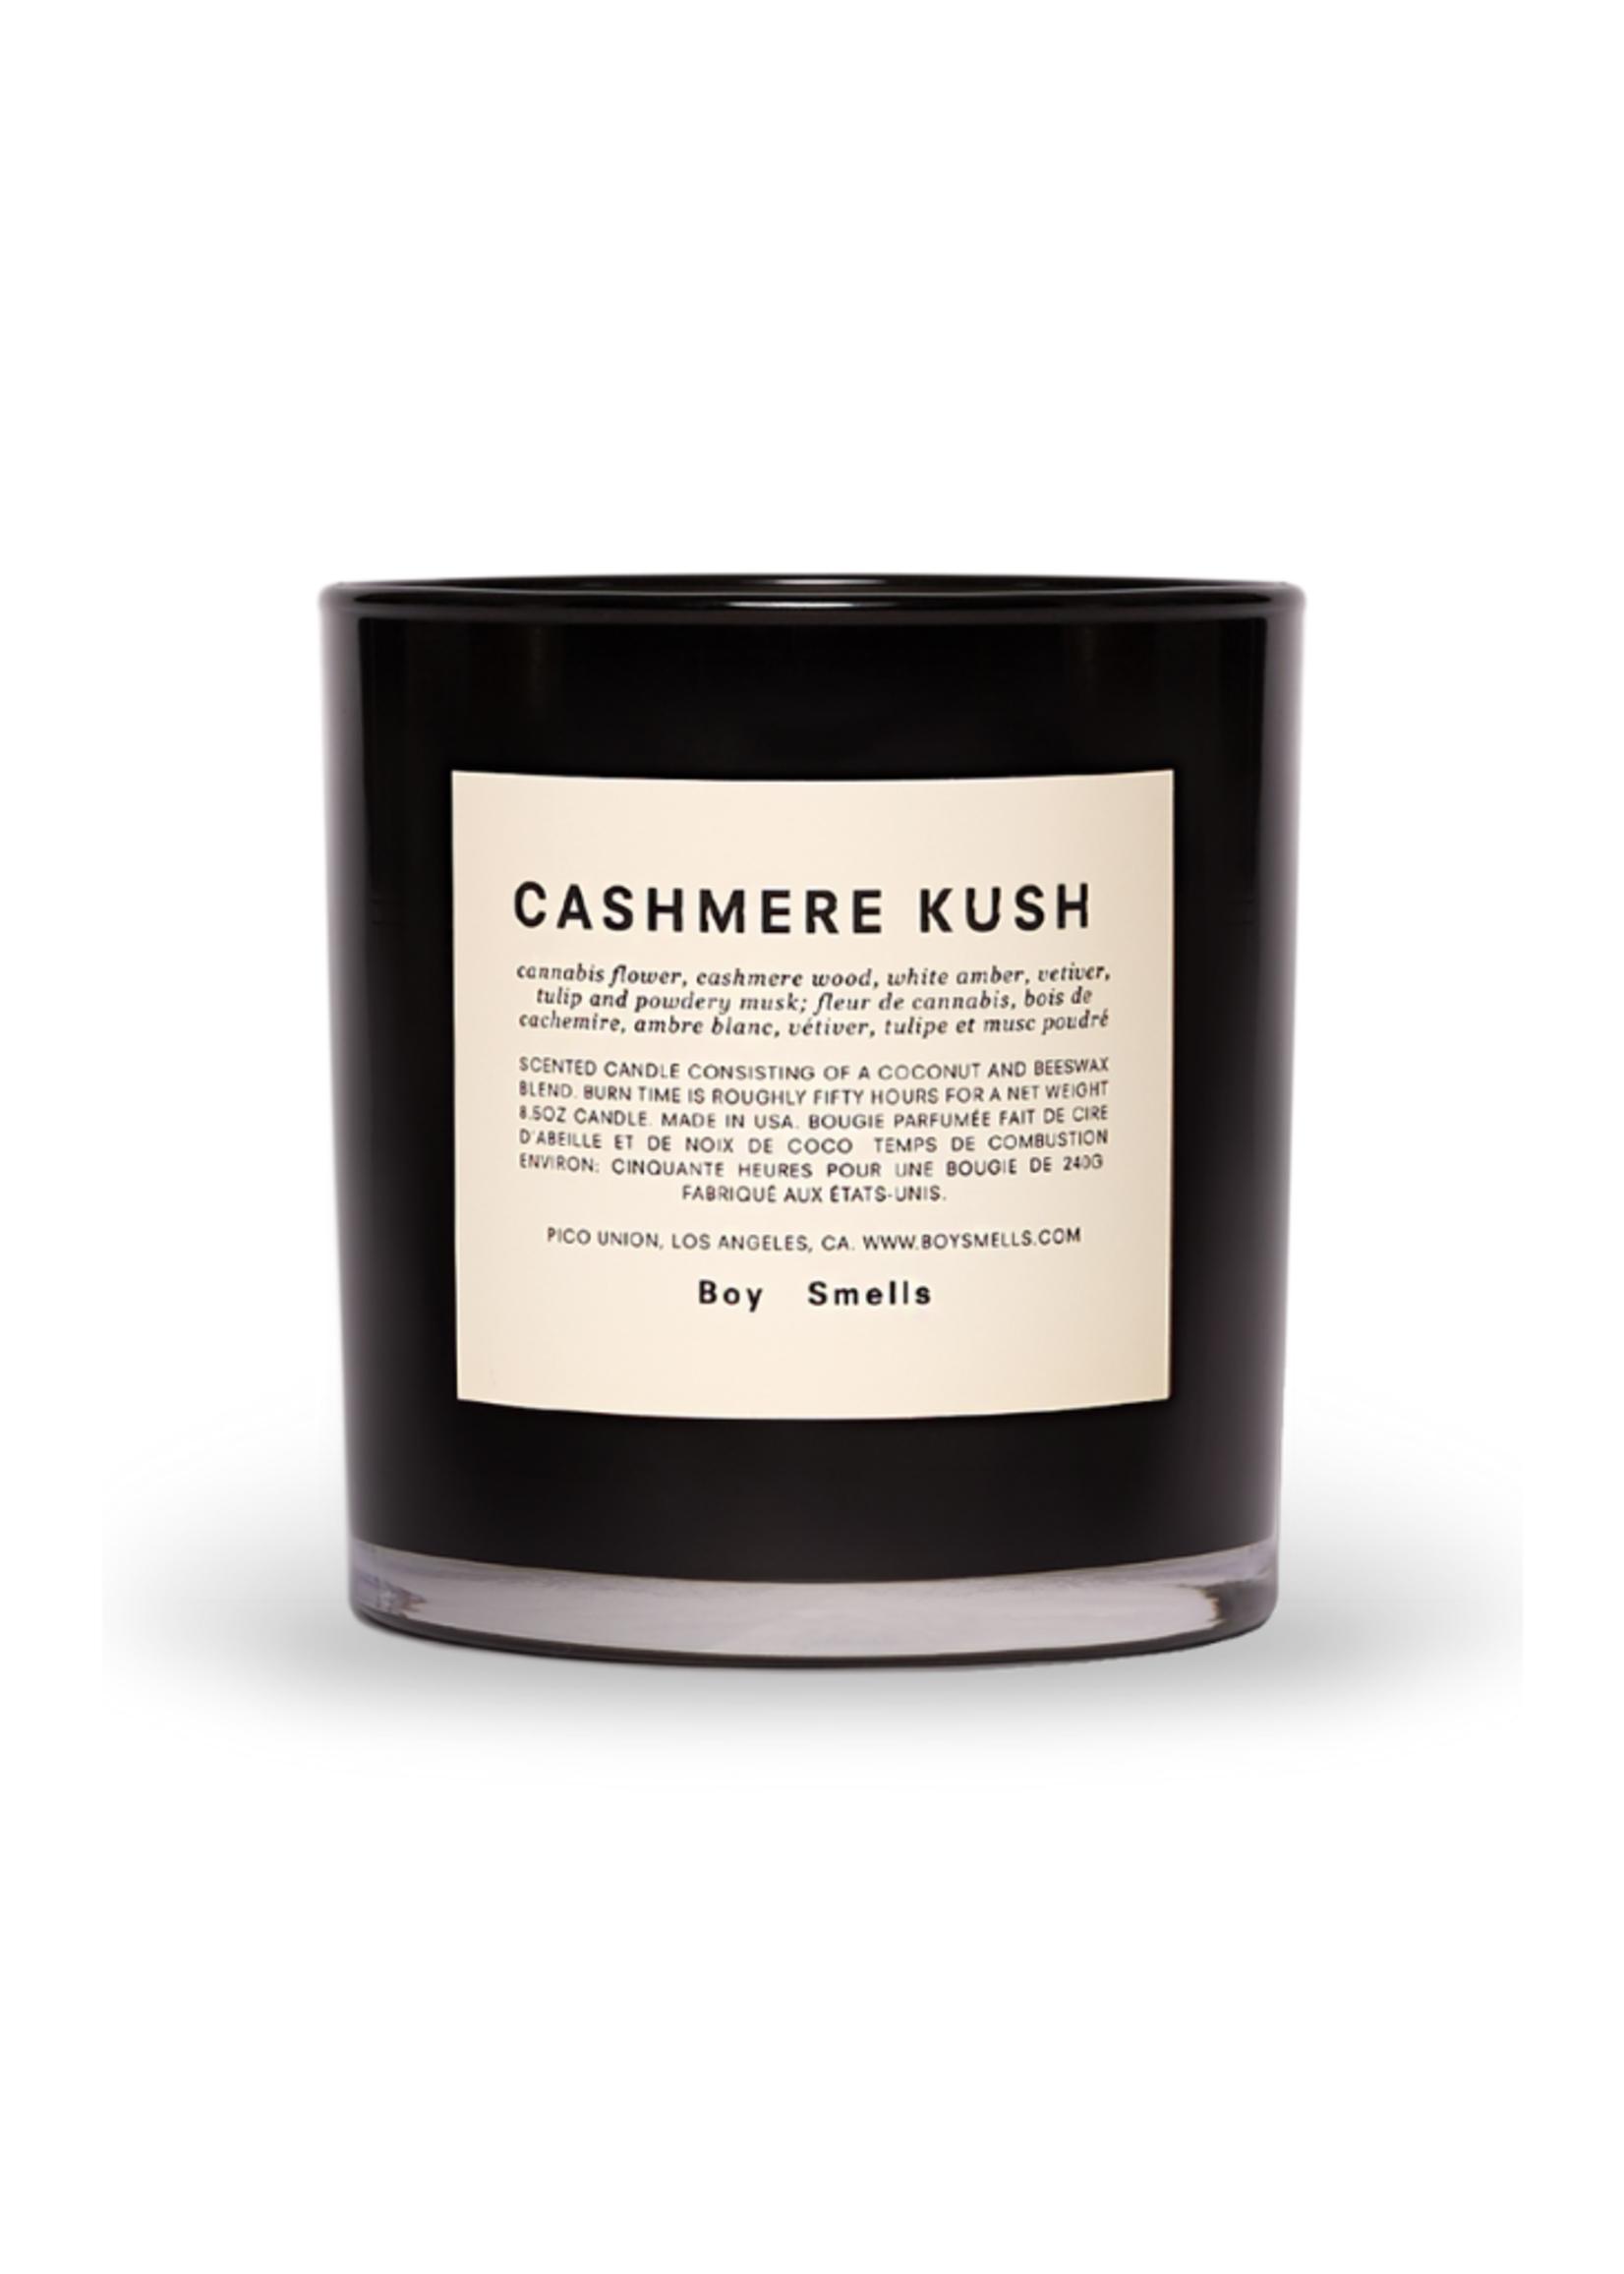 Boy Smells Cashmere Kush 8.5oz